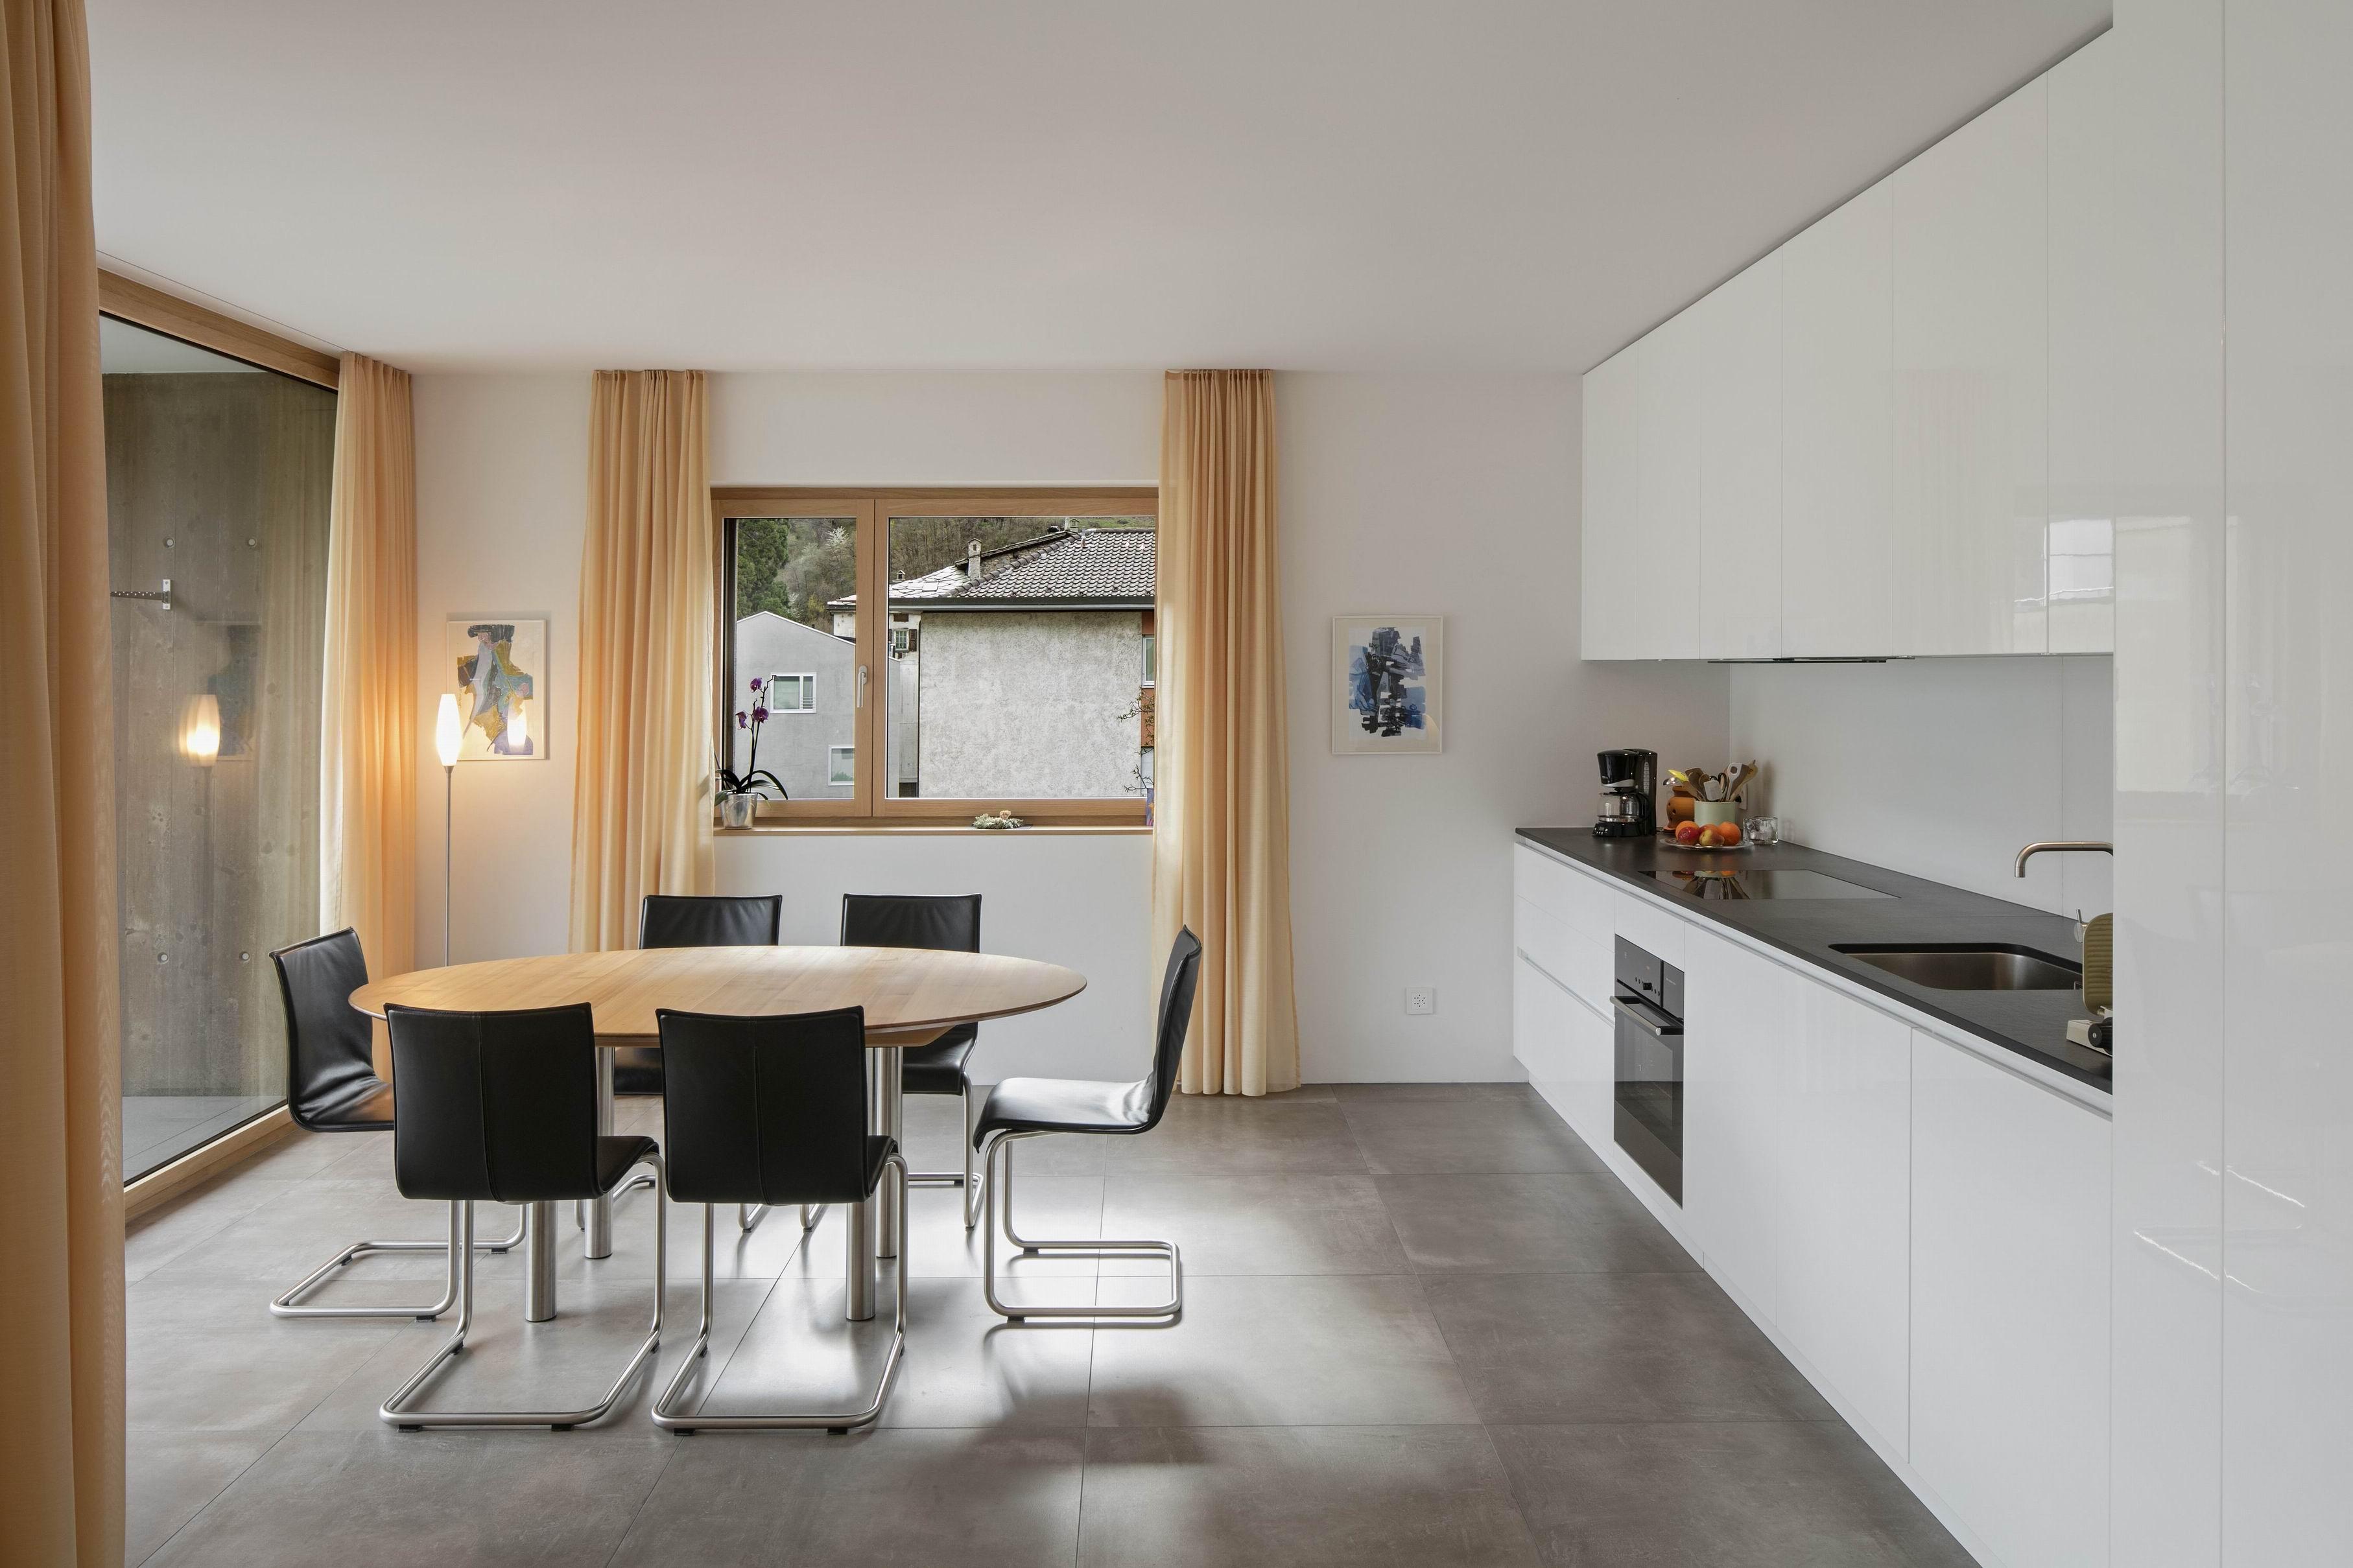 kchenhaus regensburg beautiful amazing cheap toom baumarkt regensburg with toom baumarkt. Black Bedroom Furniture Sets. Home Design Ideas